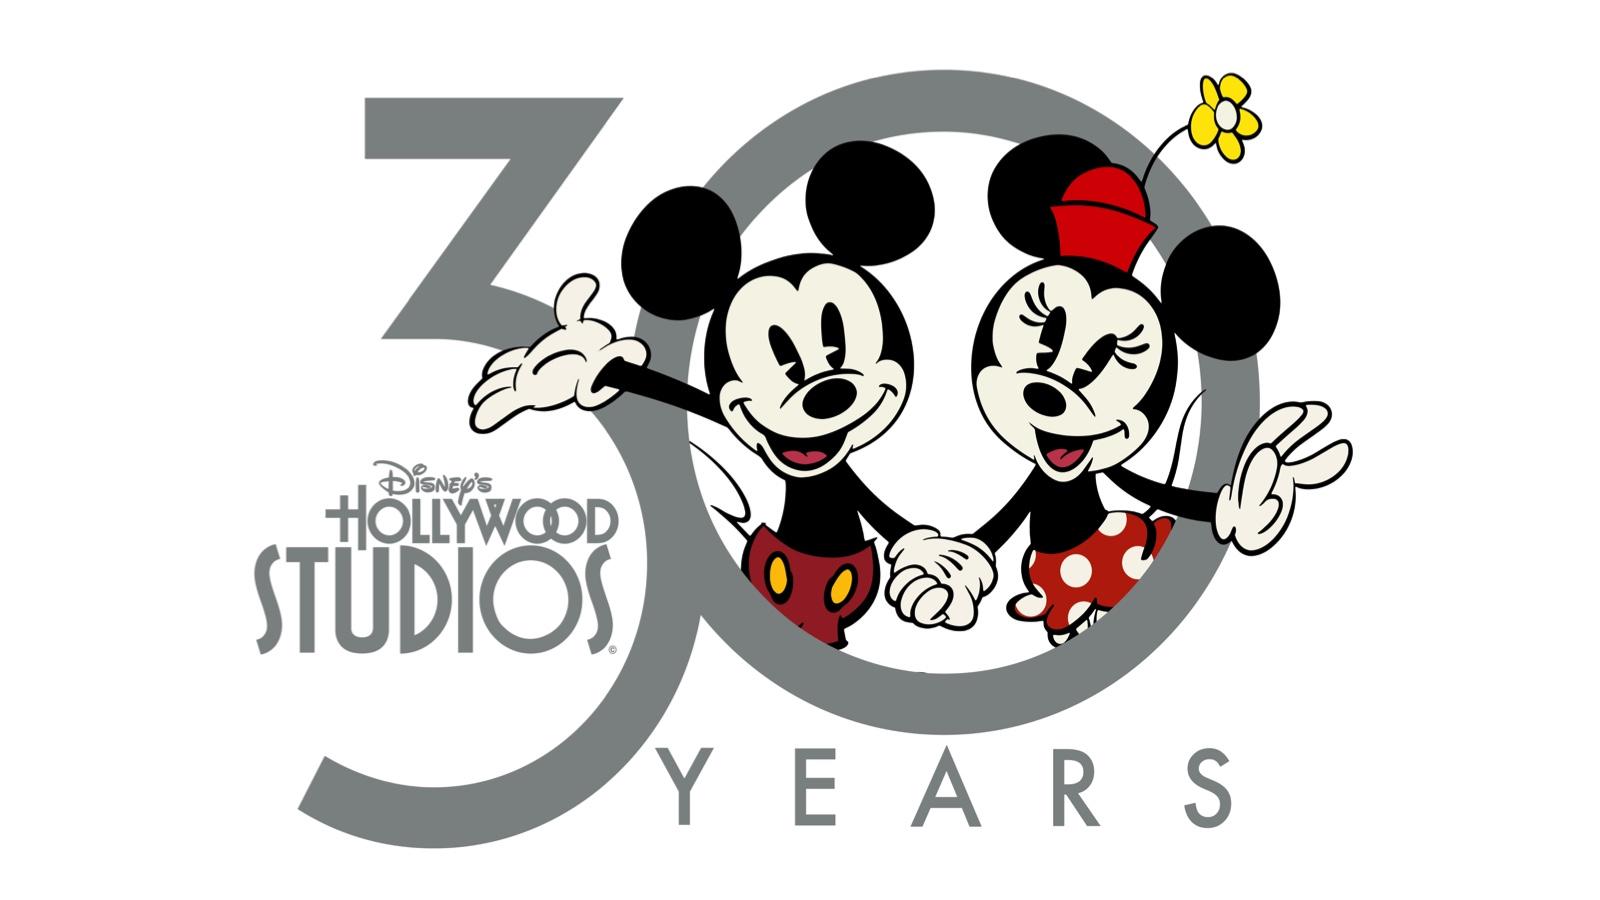 Disney\'s Hollywood Studios Celebrates Its 30th with New Logo.